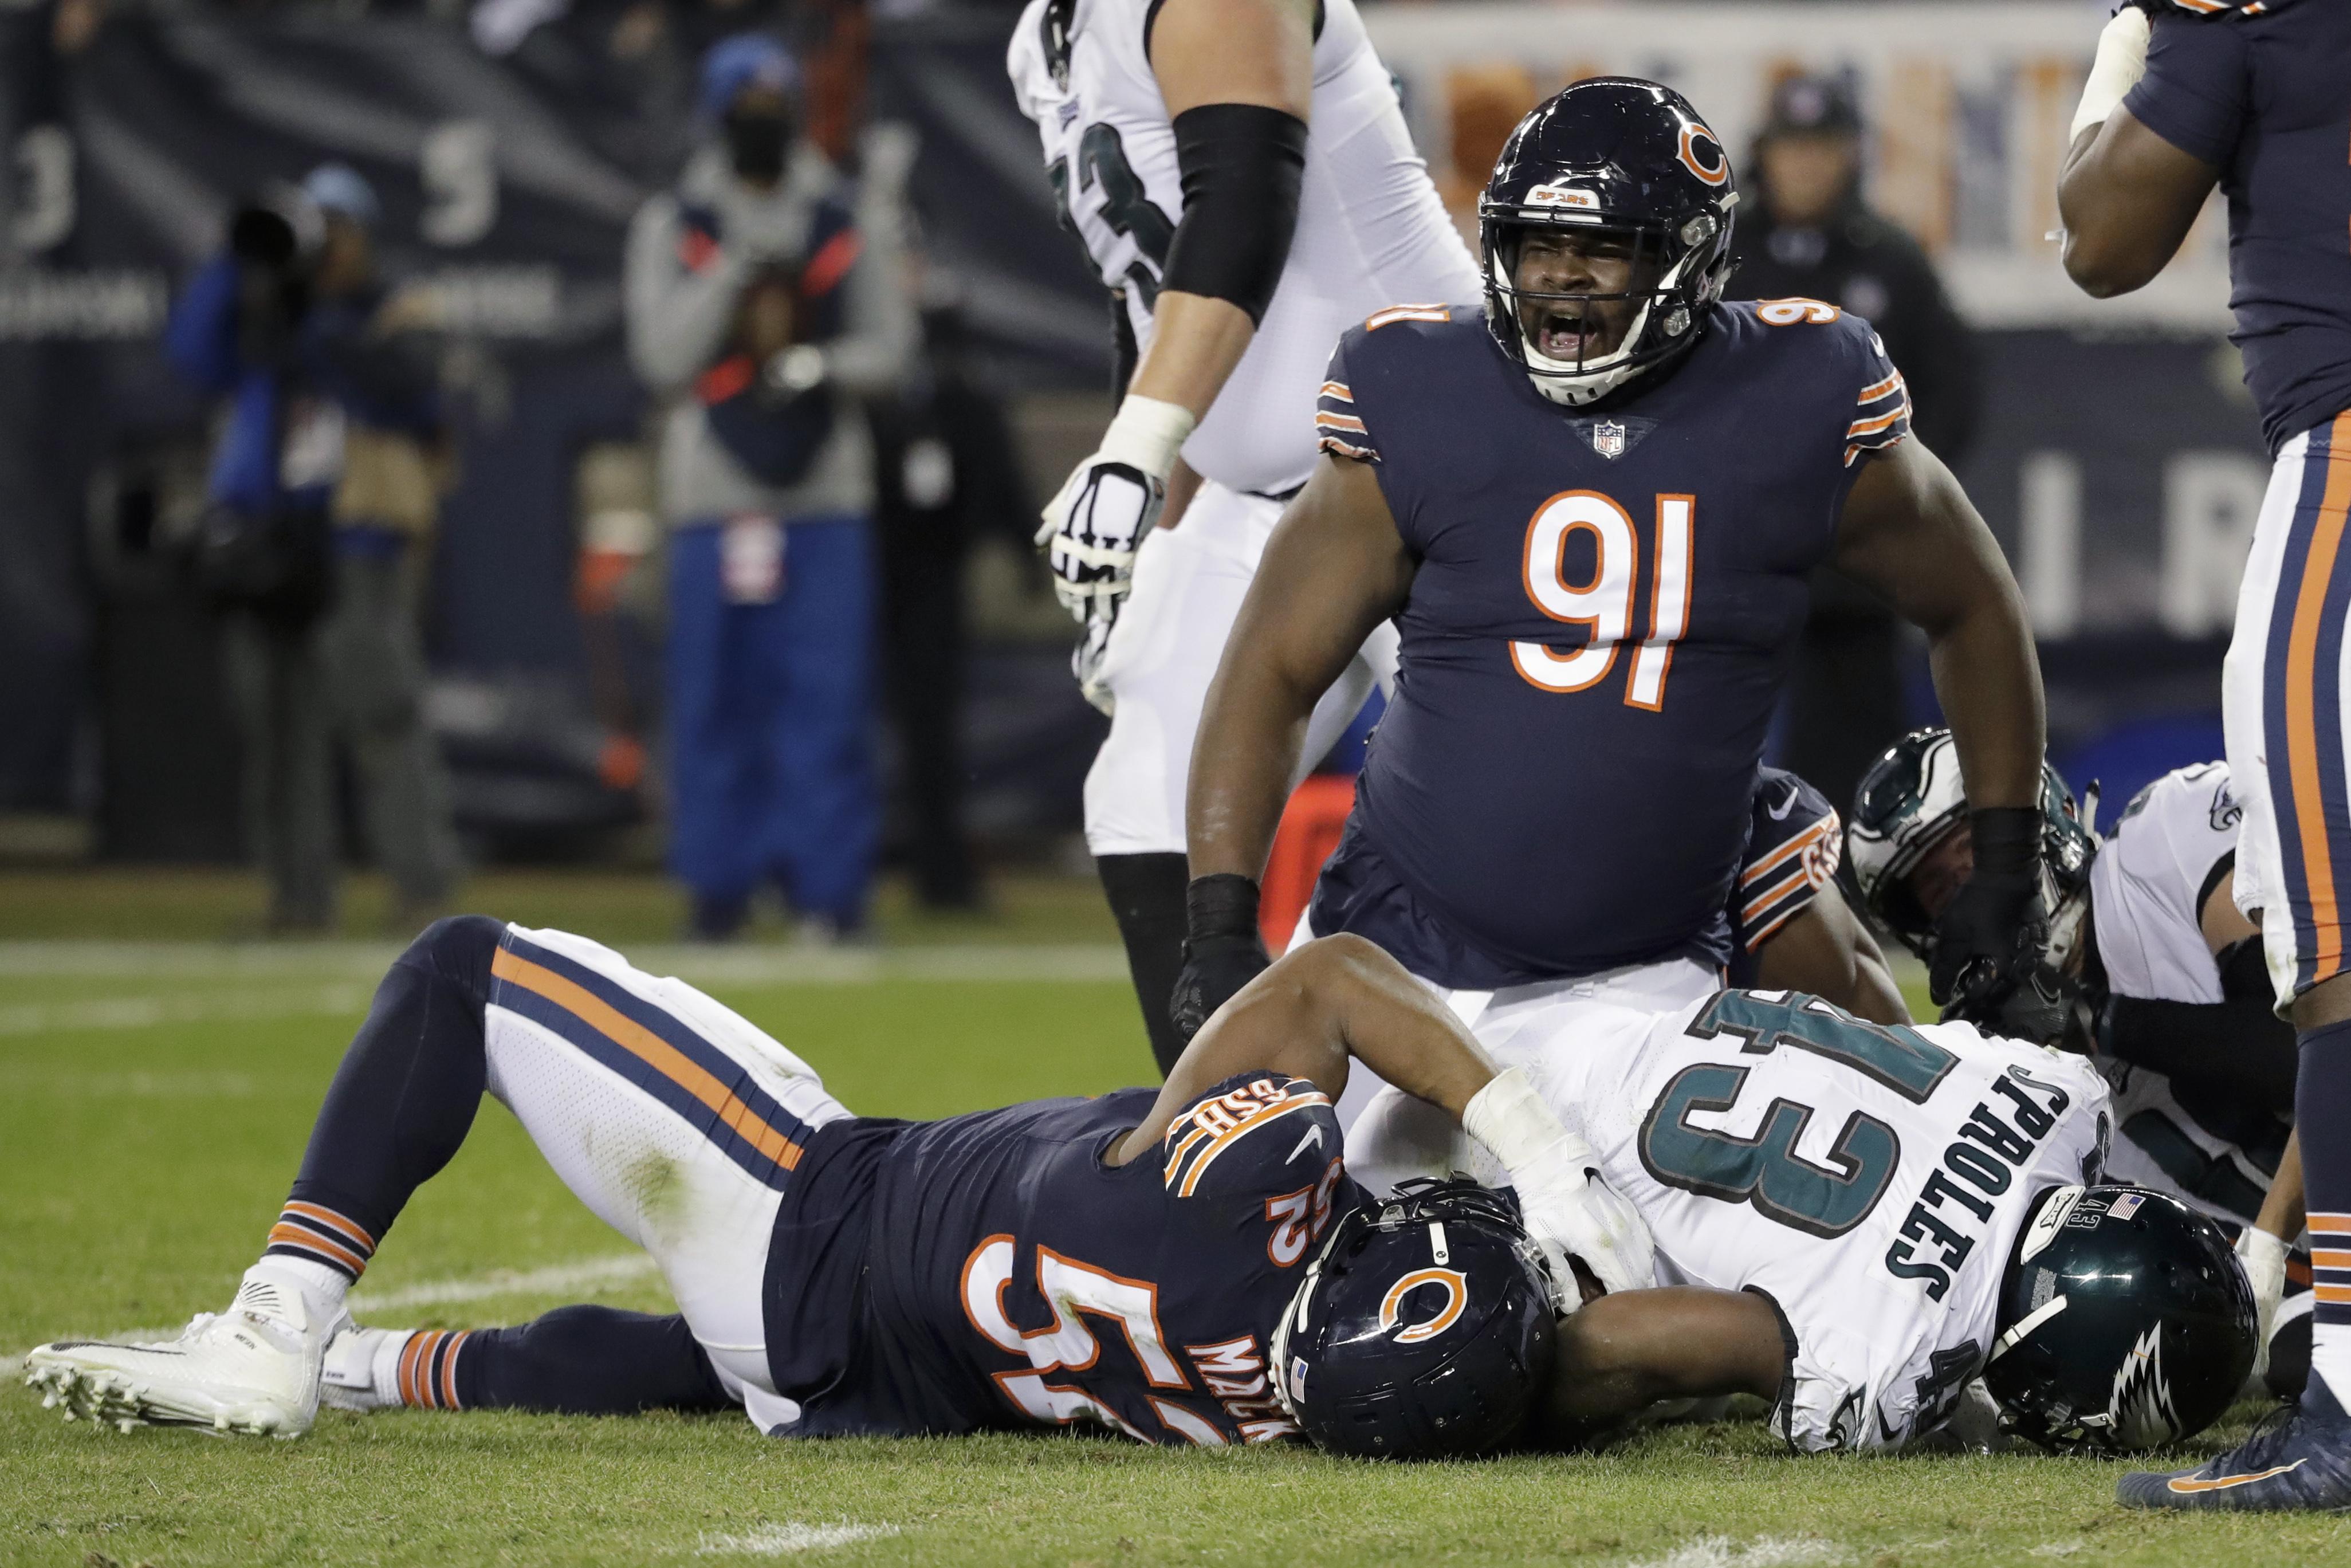 Eddie Goldman (91) has not played for the Bears since Week 17 of the 2019 season against the Vikings.